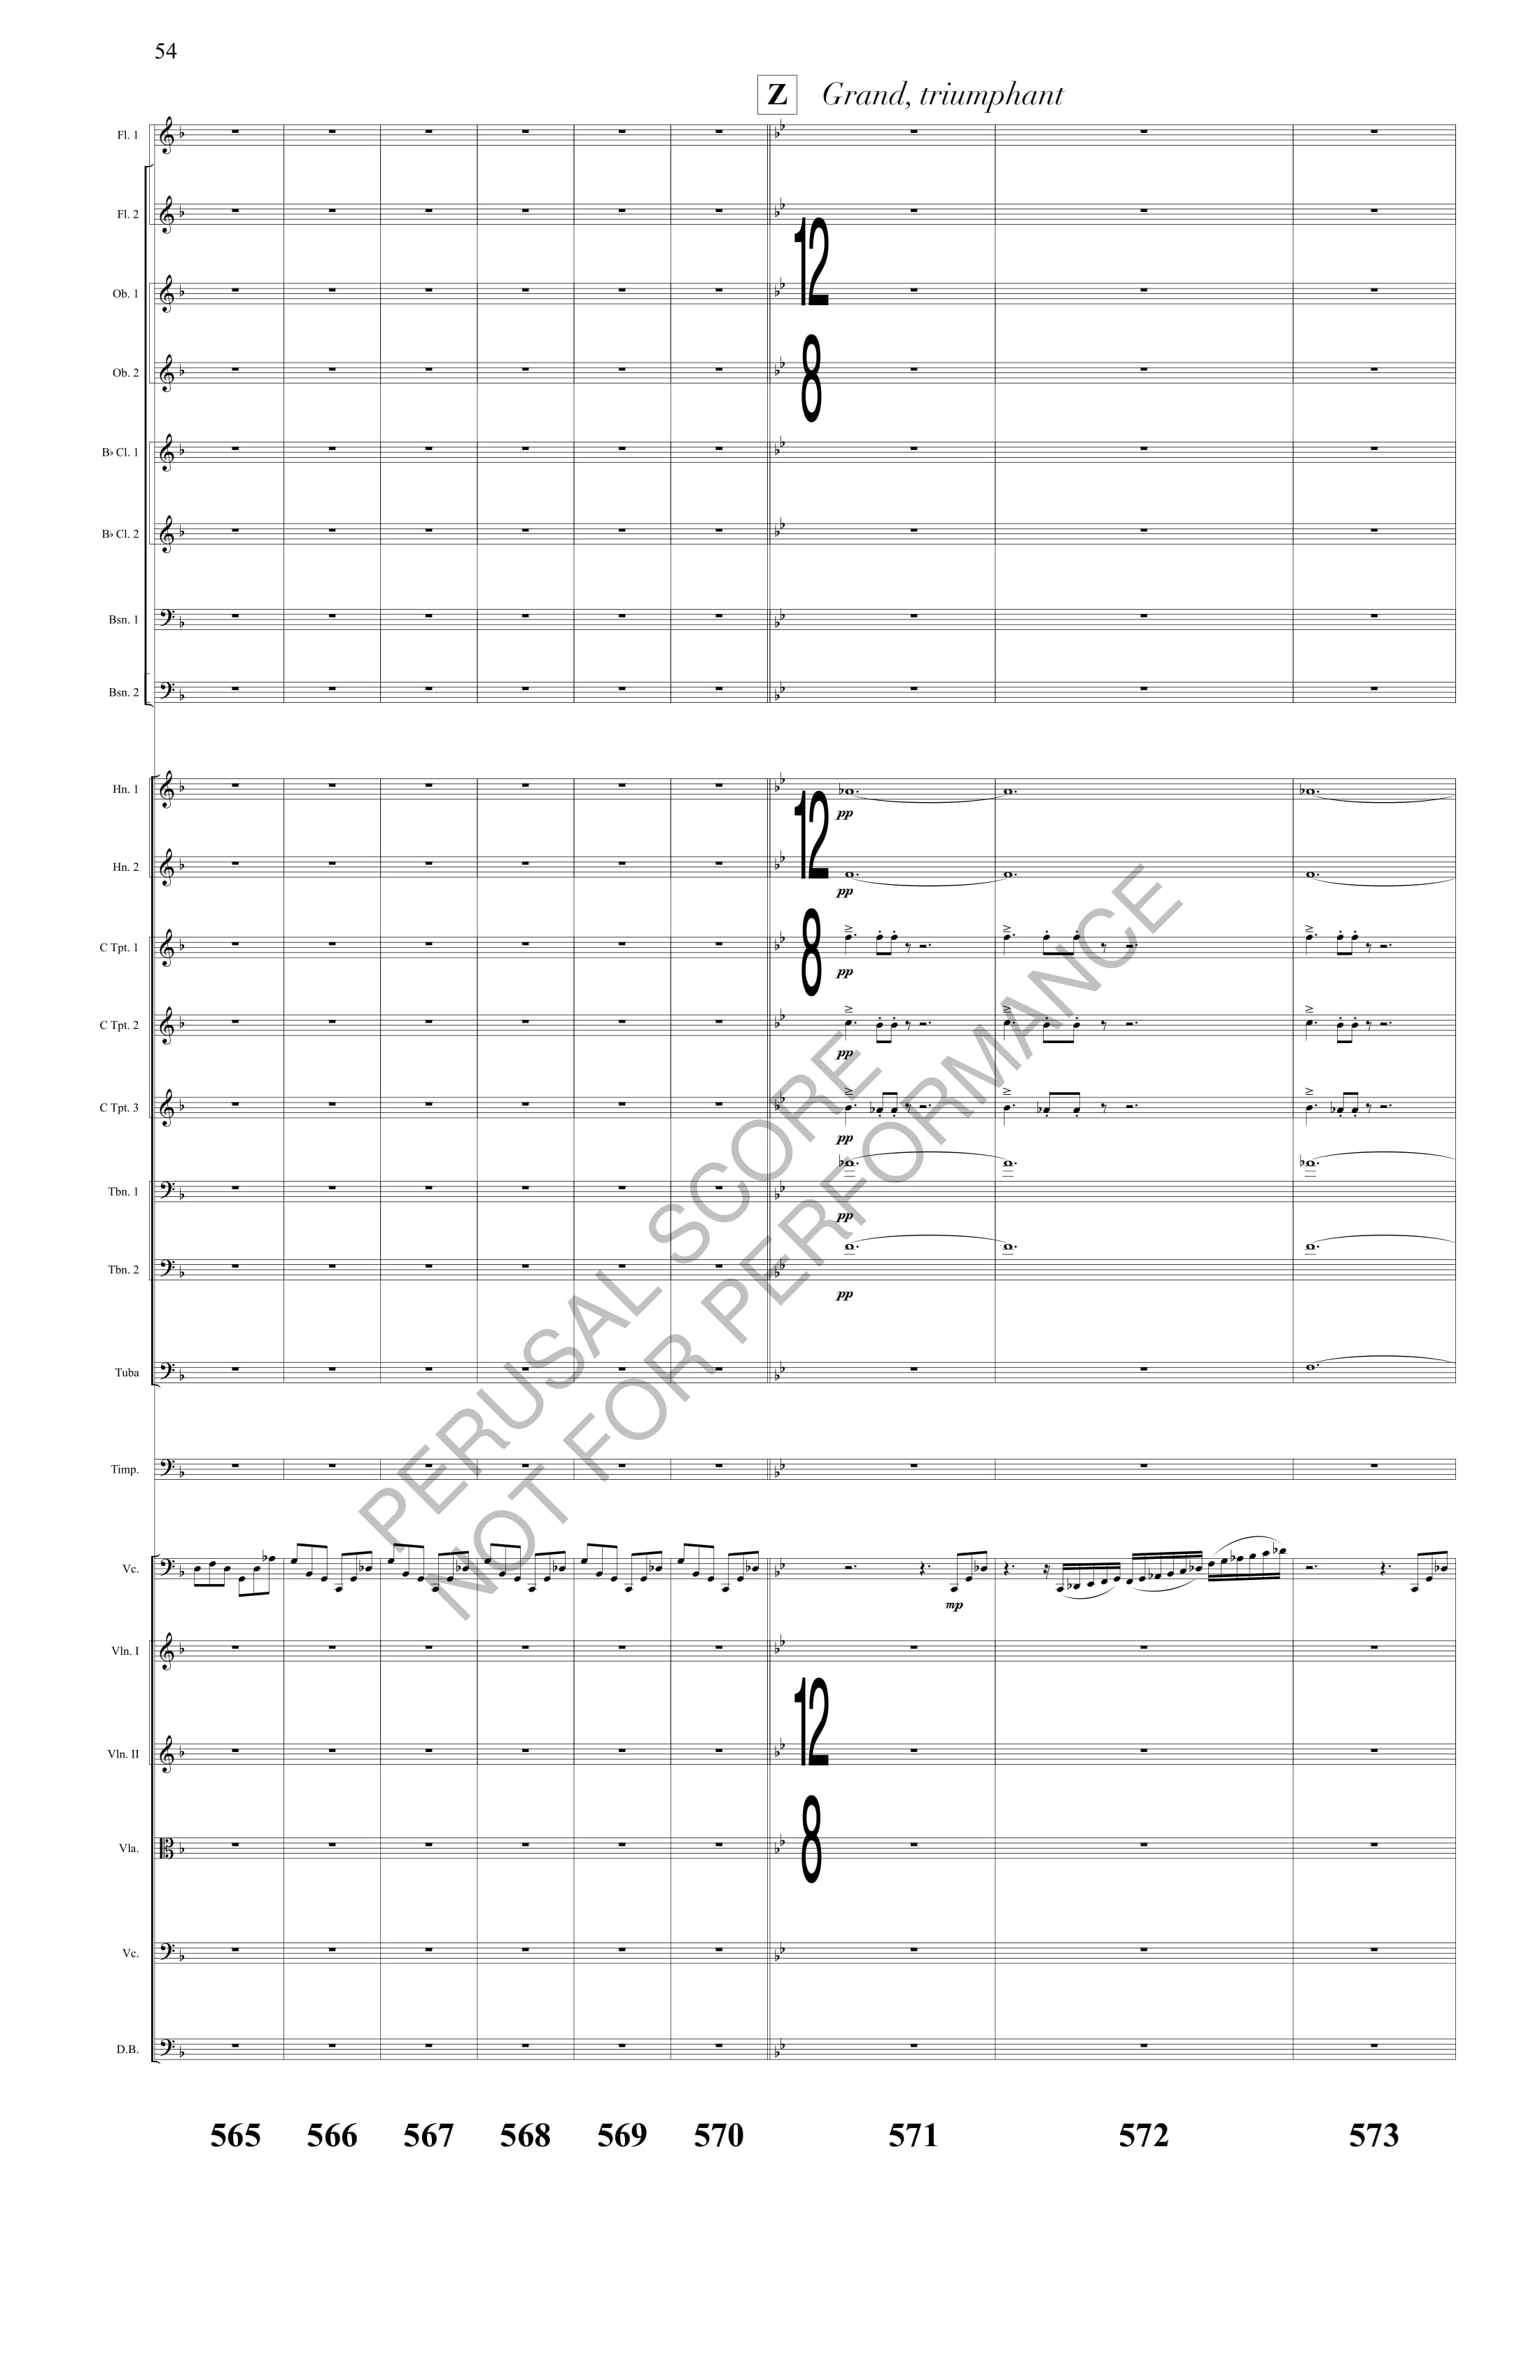 Boyd Tekton Score-watermark-60.jpg